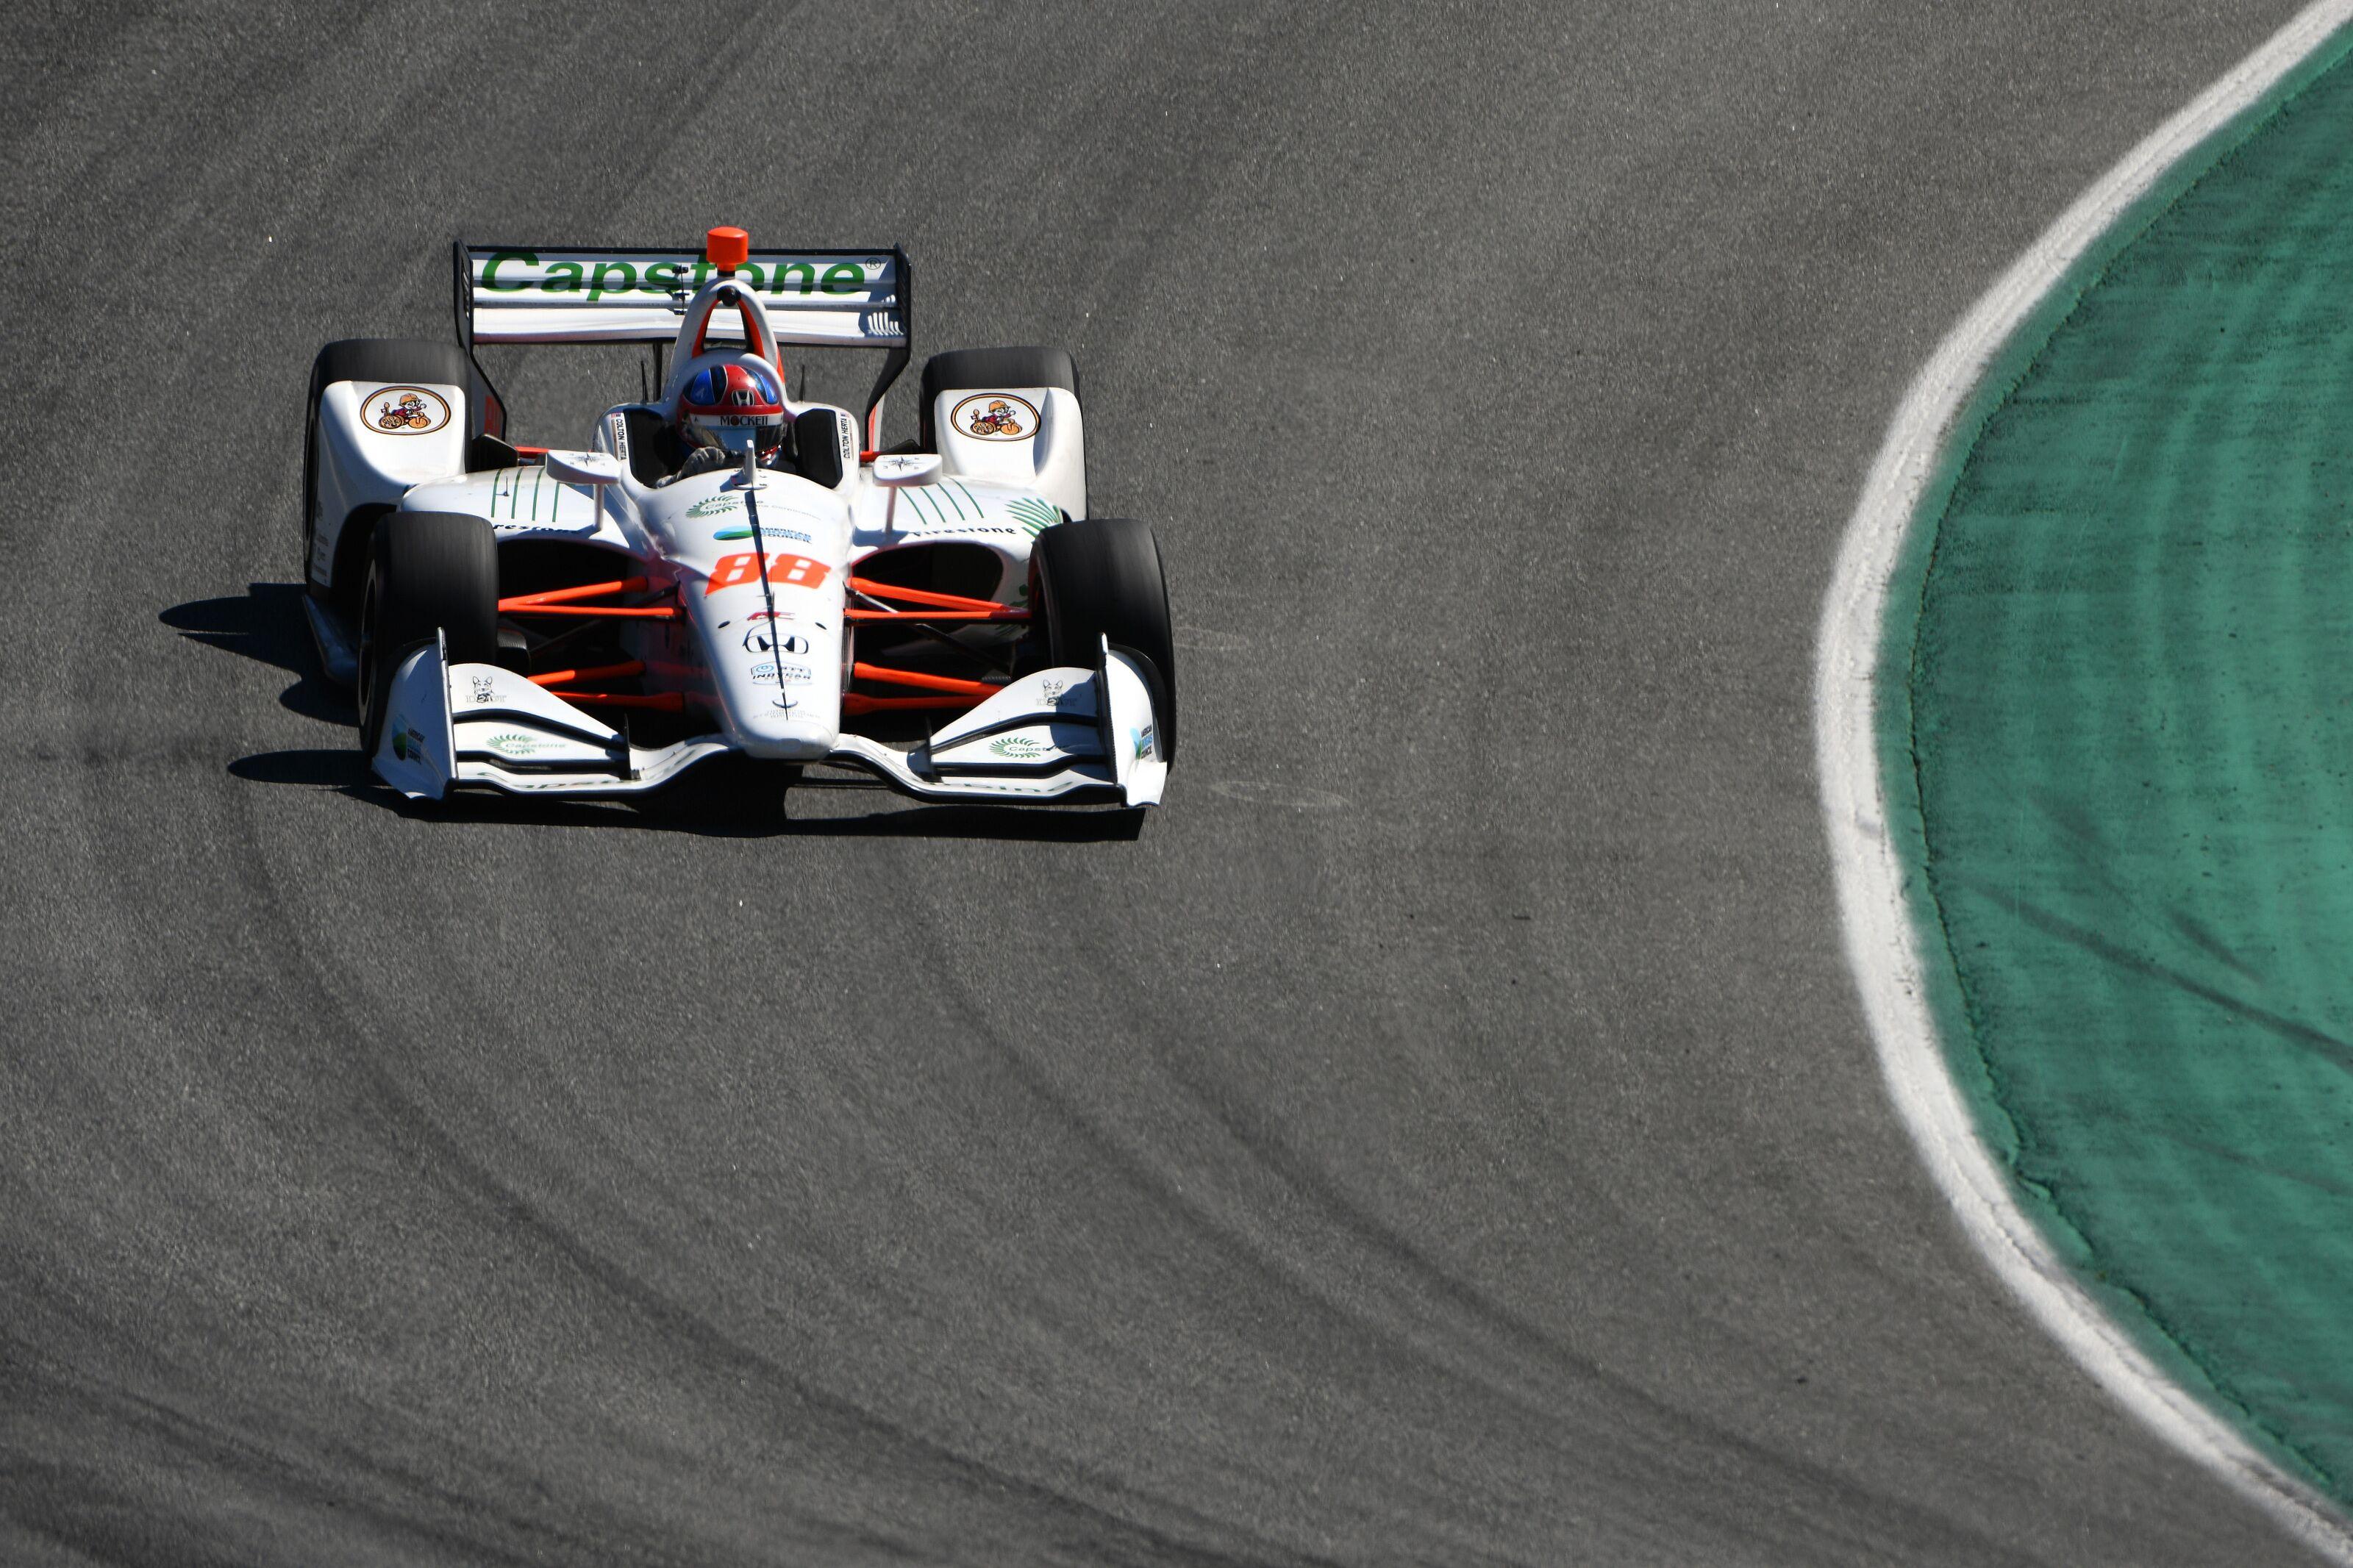 IndyCar: Colton Herta wins 2019 Firestone Grand Prix of Monterey